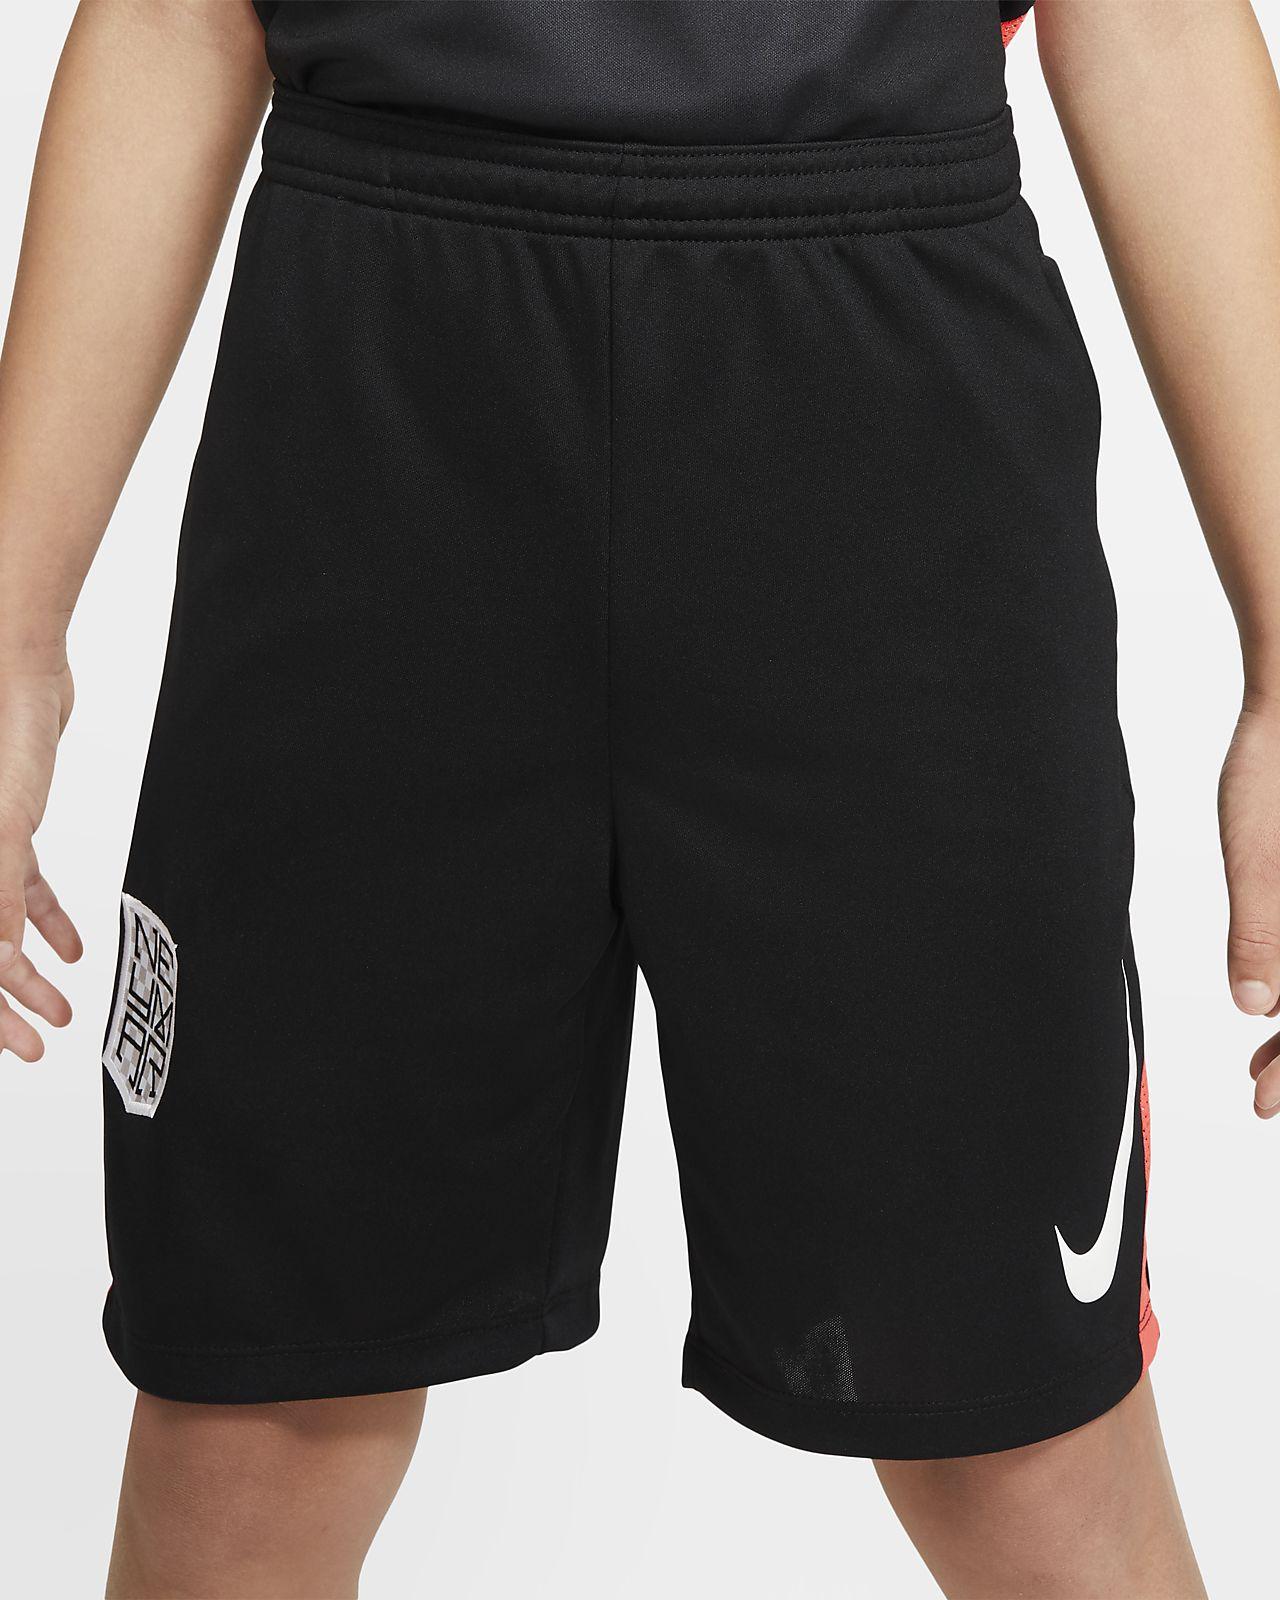 Nike Dri-FIT Neymar Jr. Fußball-Shorts für ältere Kinder